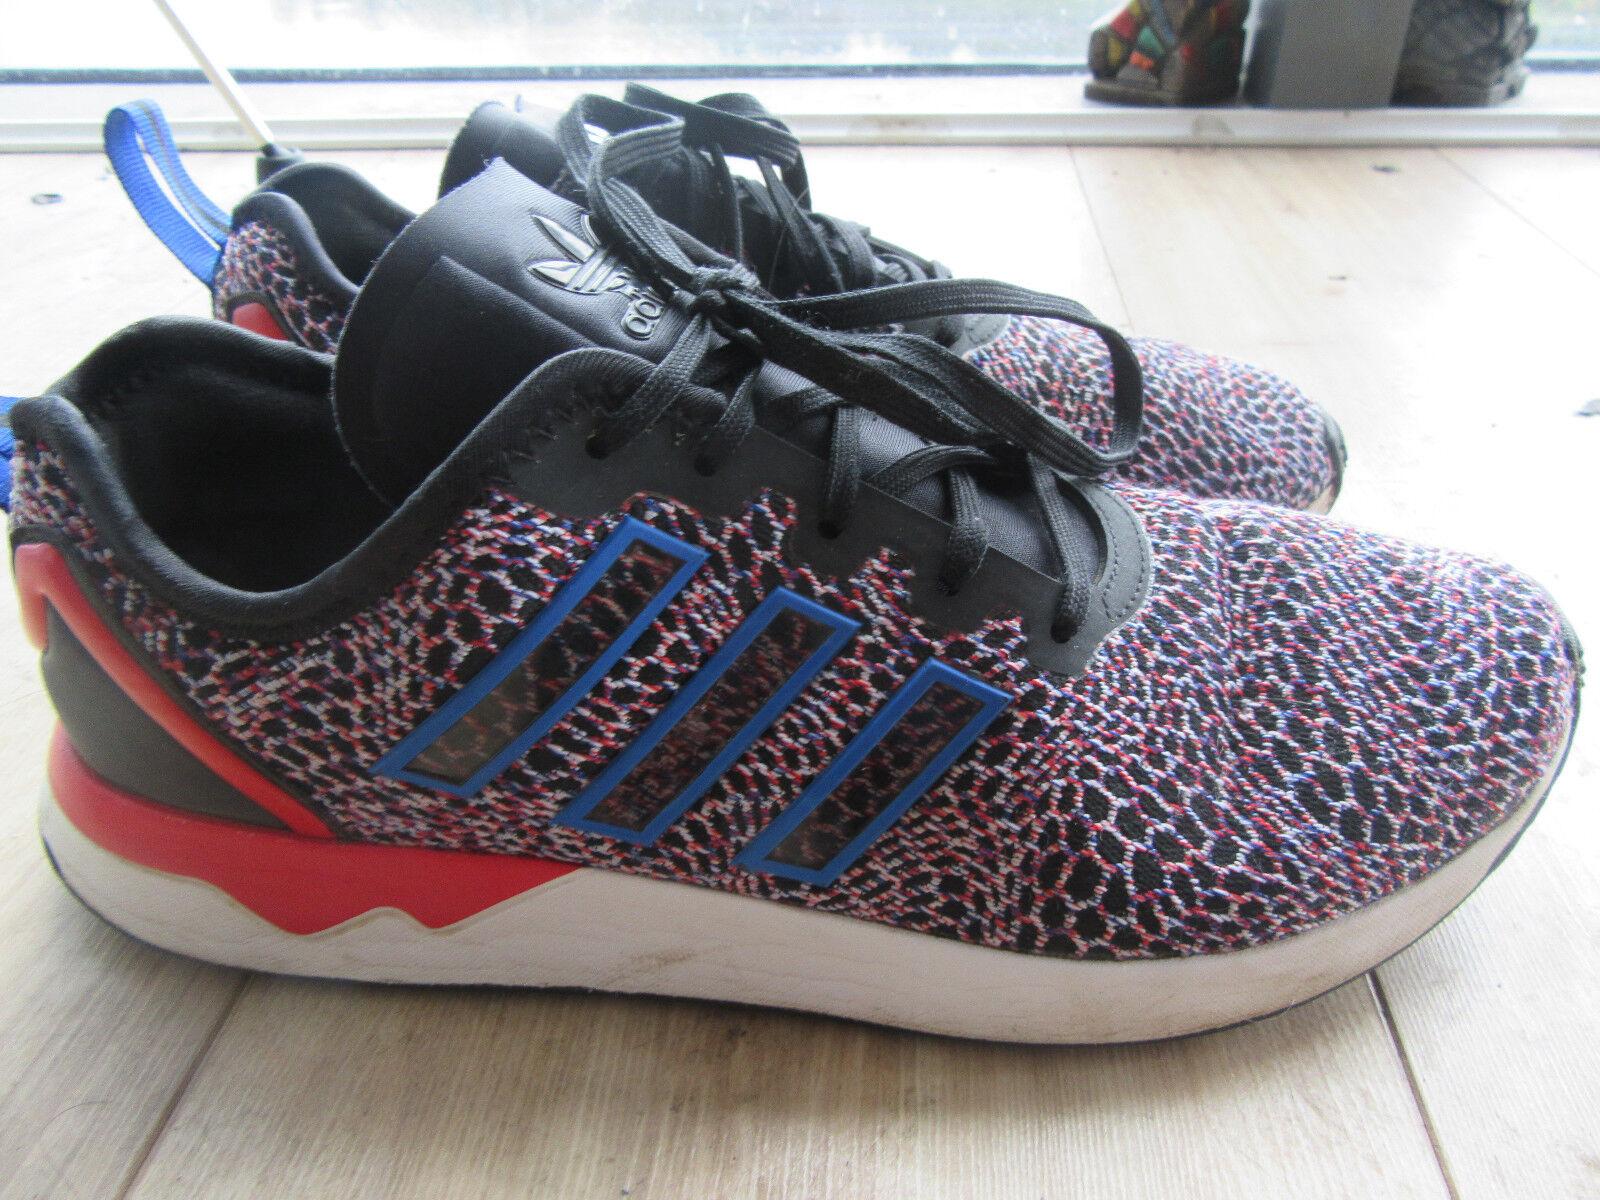 Adidas Originals ZX Flux Adv Trainers